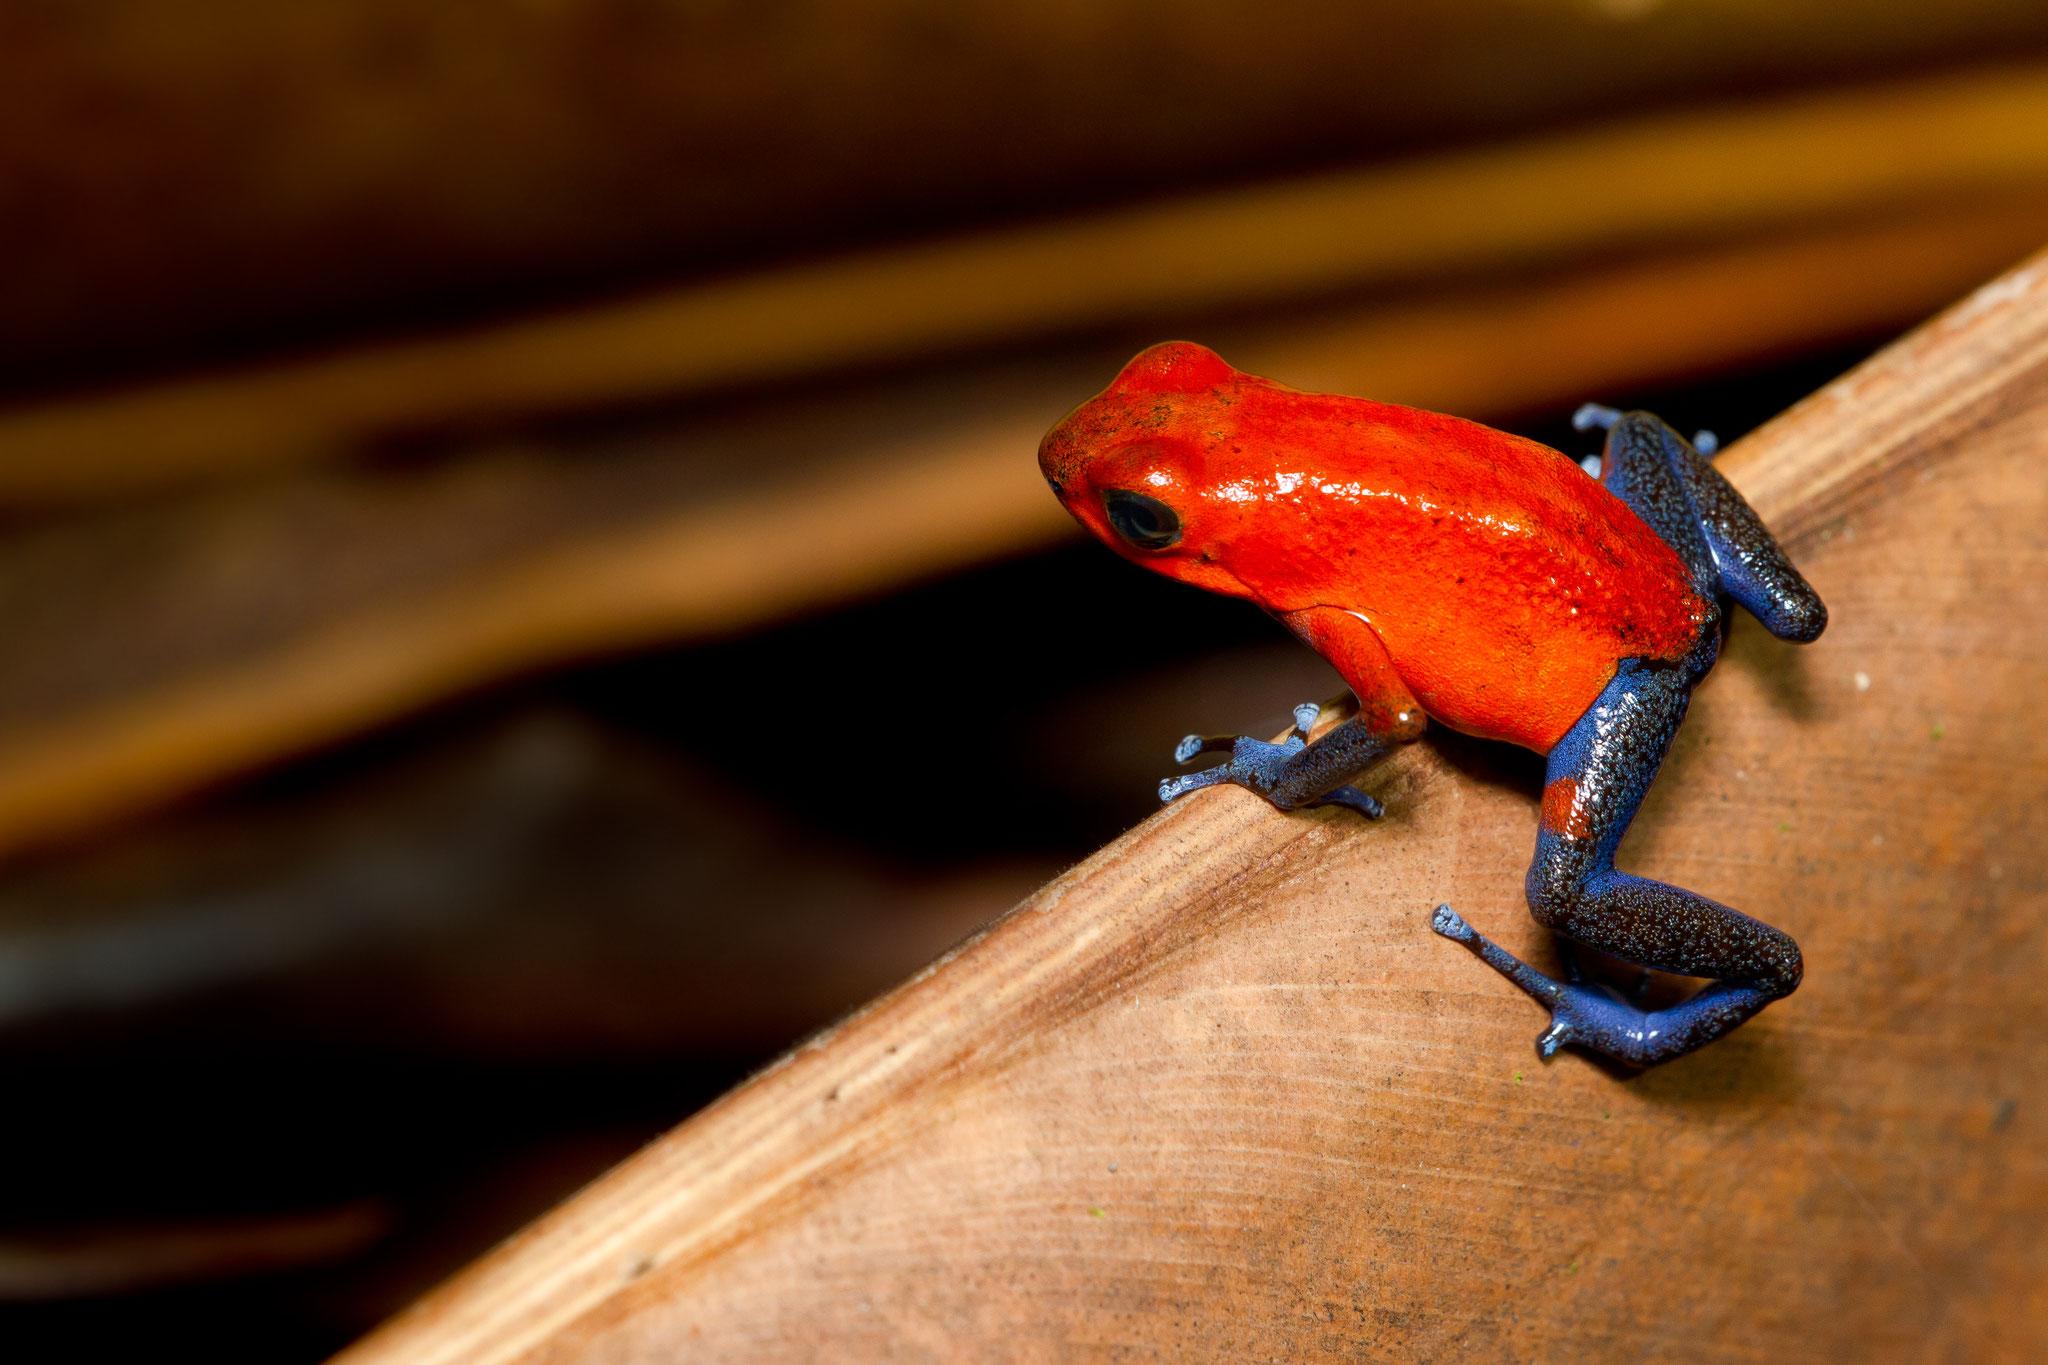 Dendrobates dendrobates pumilio Costa Rica @Pascal Jahan